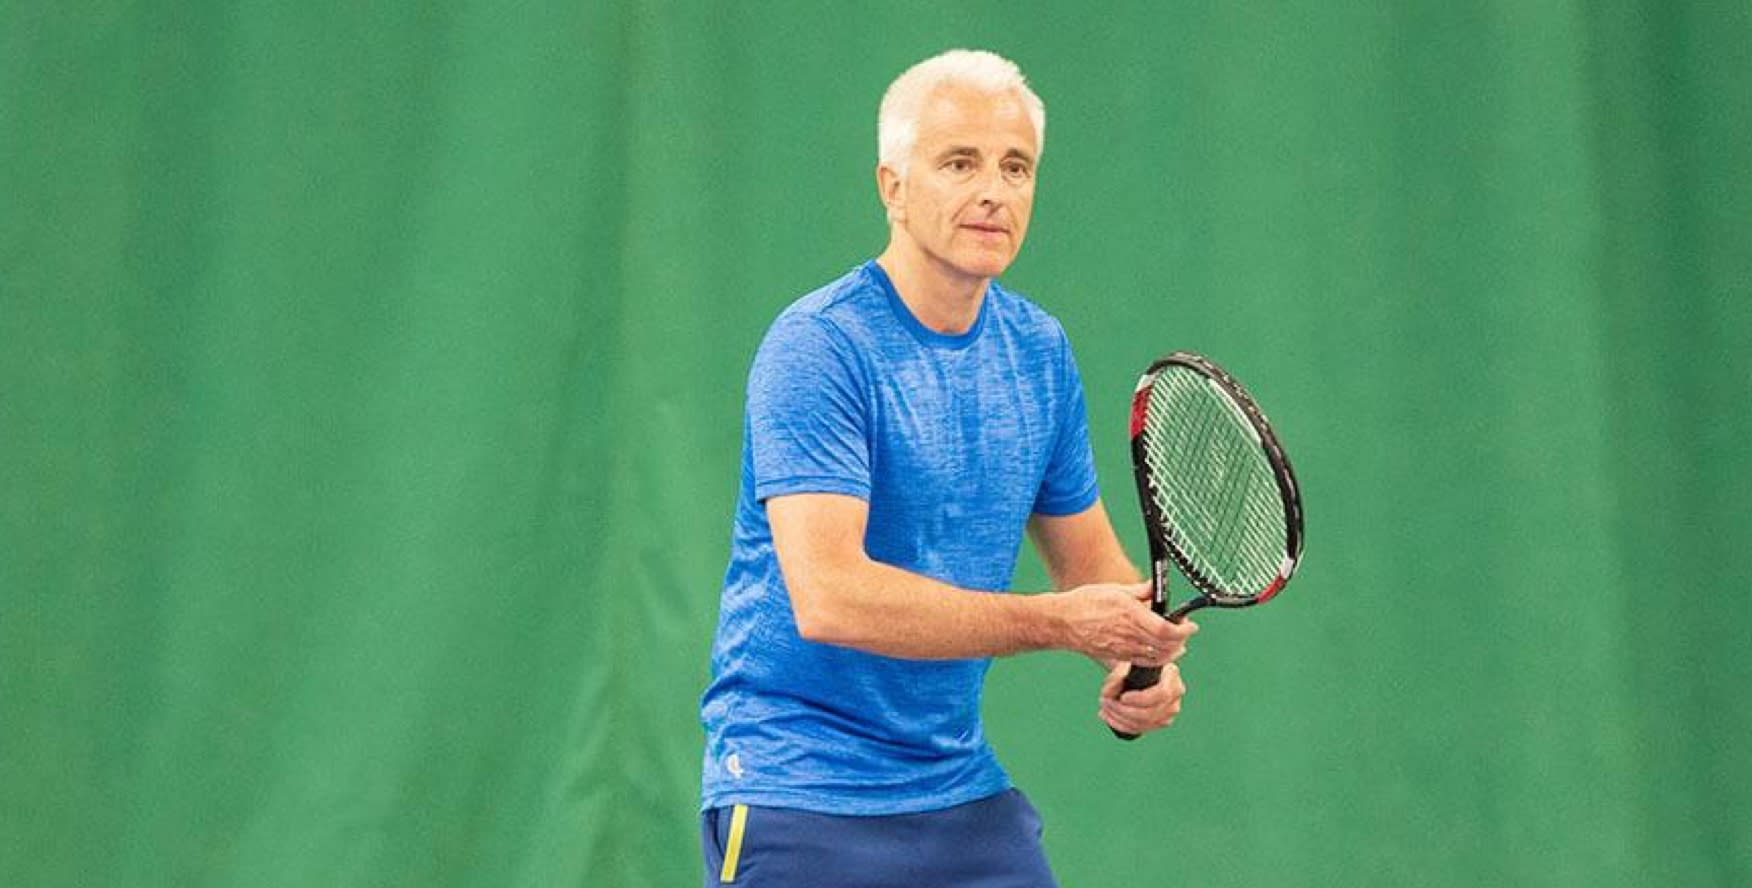 A man enjoying a game of tennis